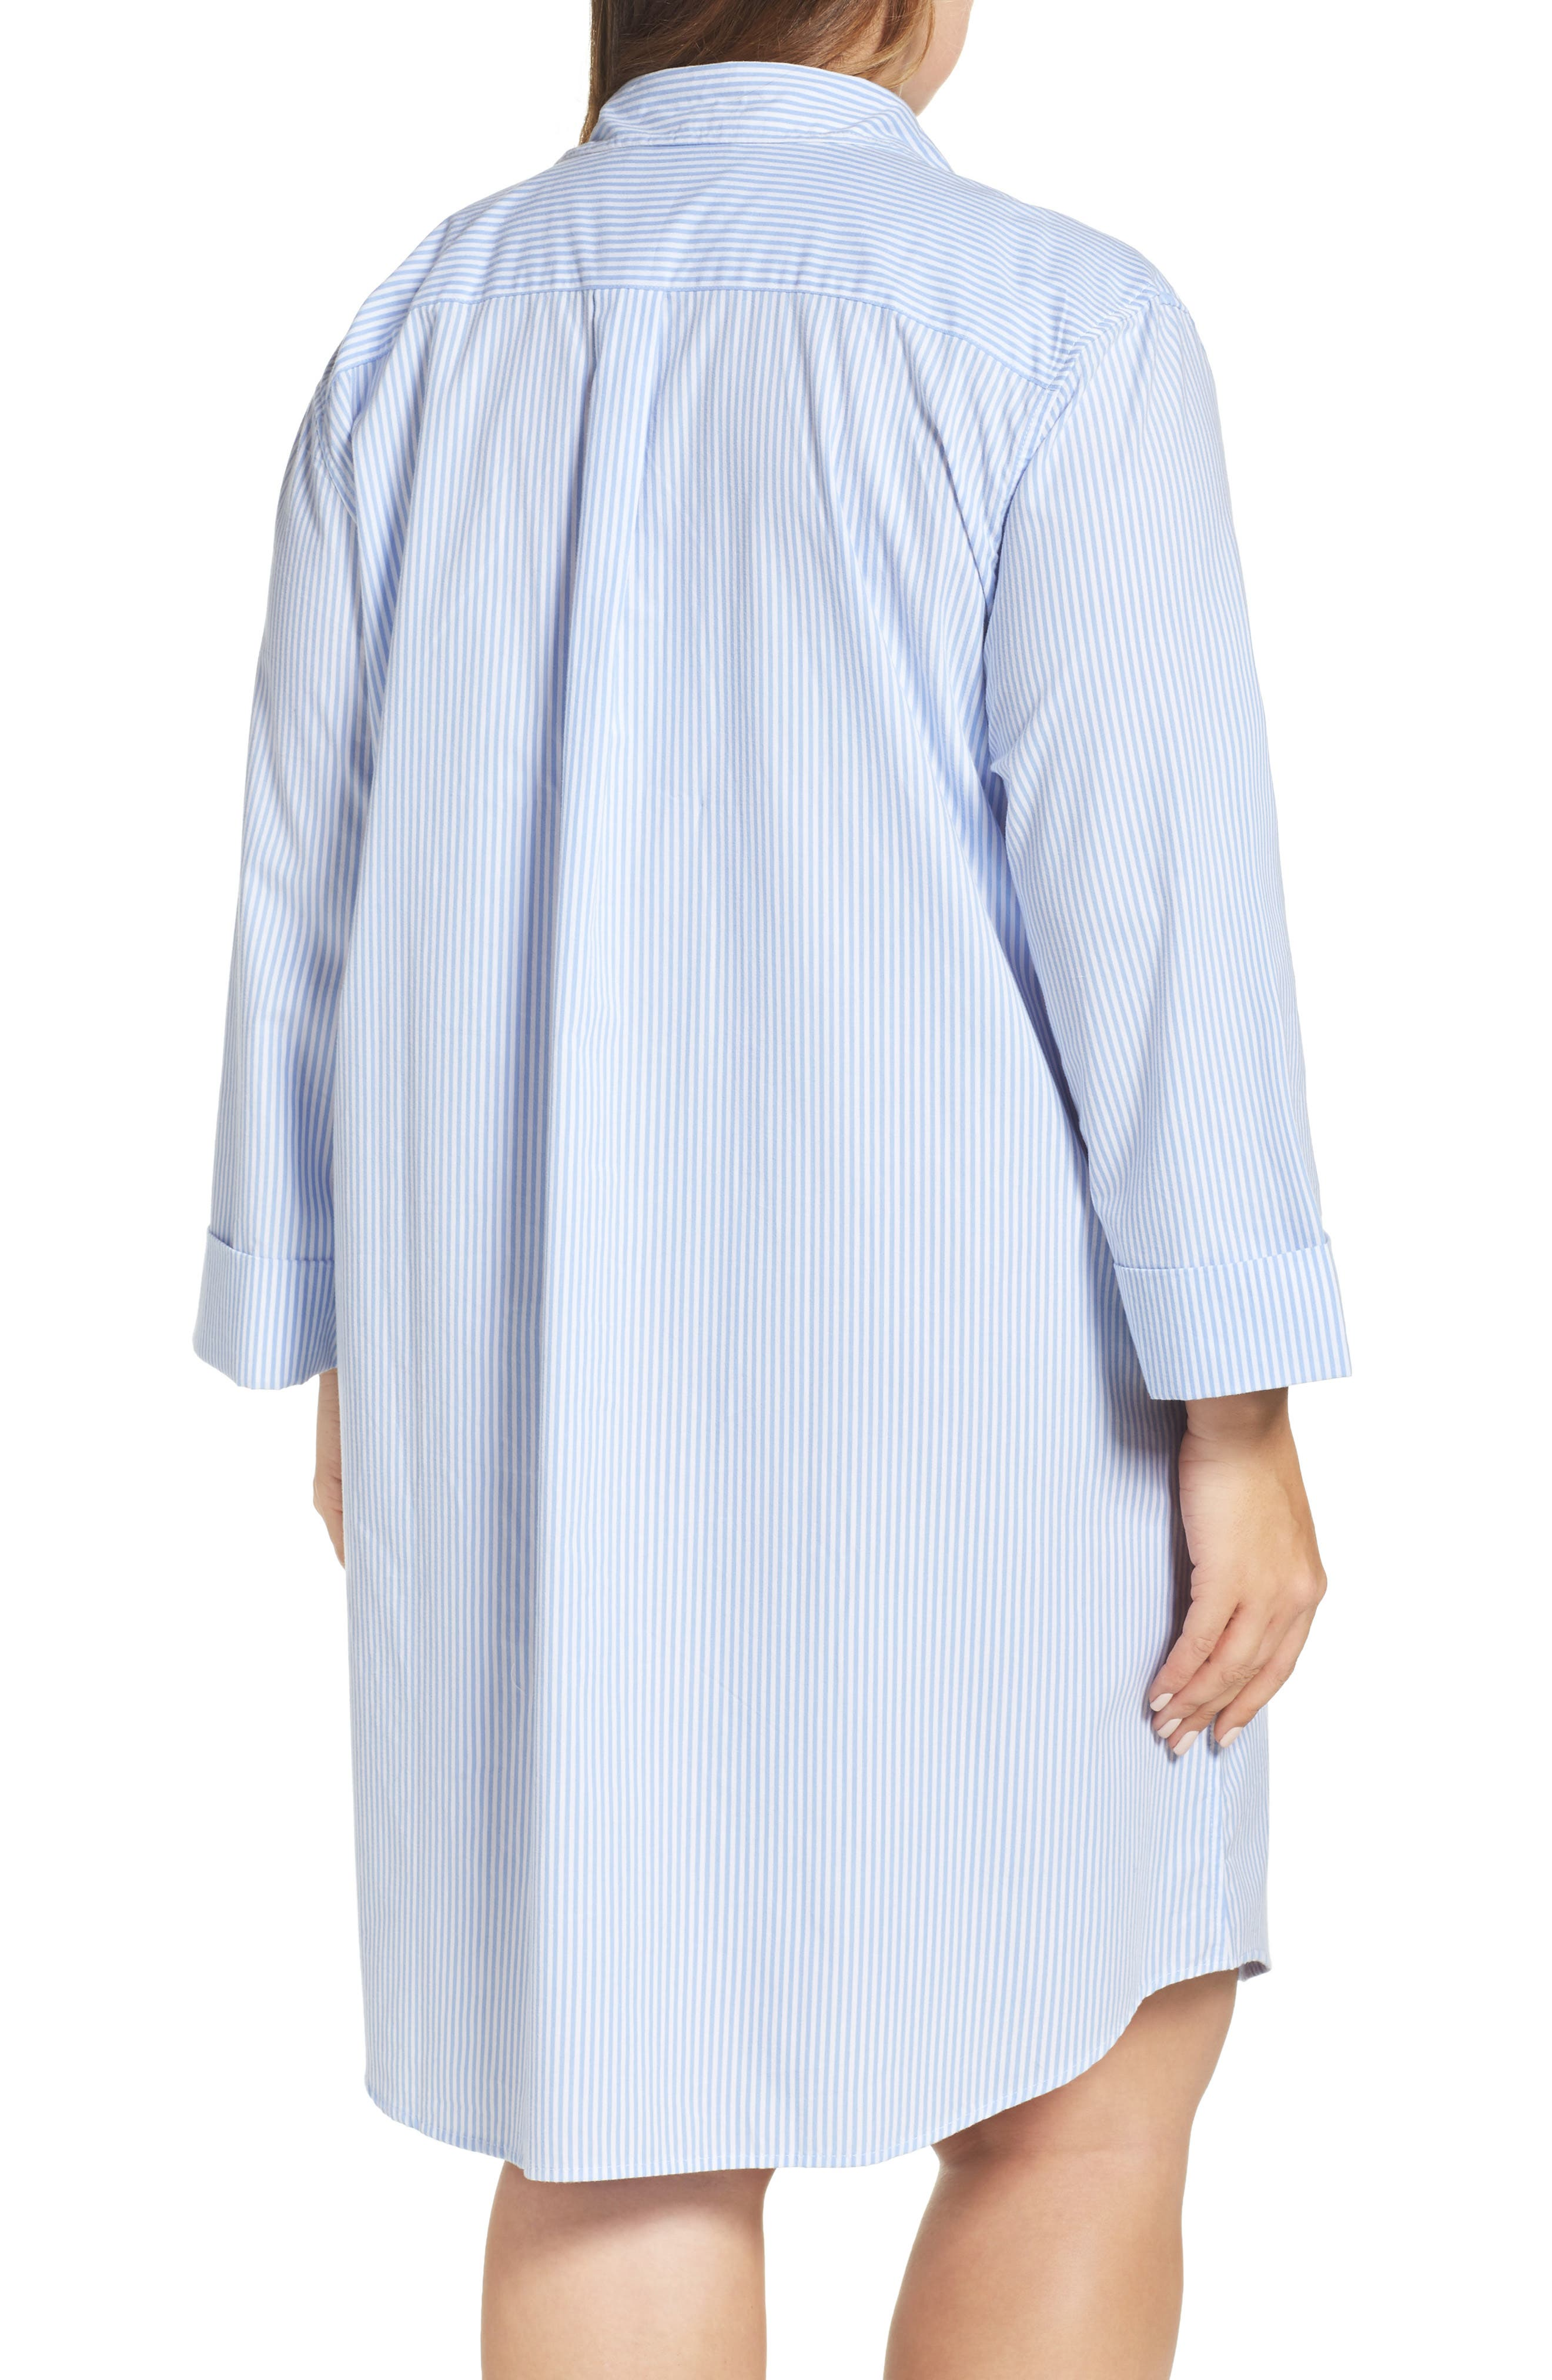 Sleep Shirt,                             Alternate thumbnail 2, color,                             Stripe French Blue/ White